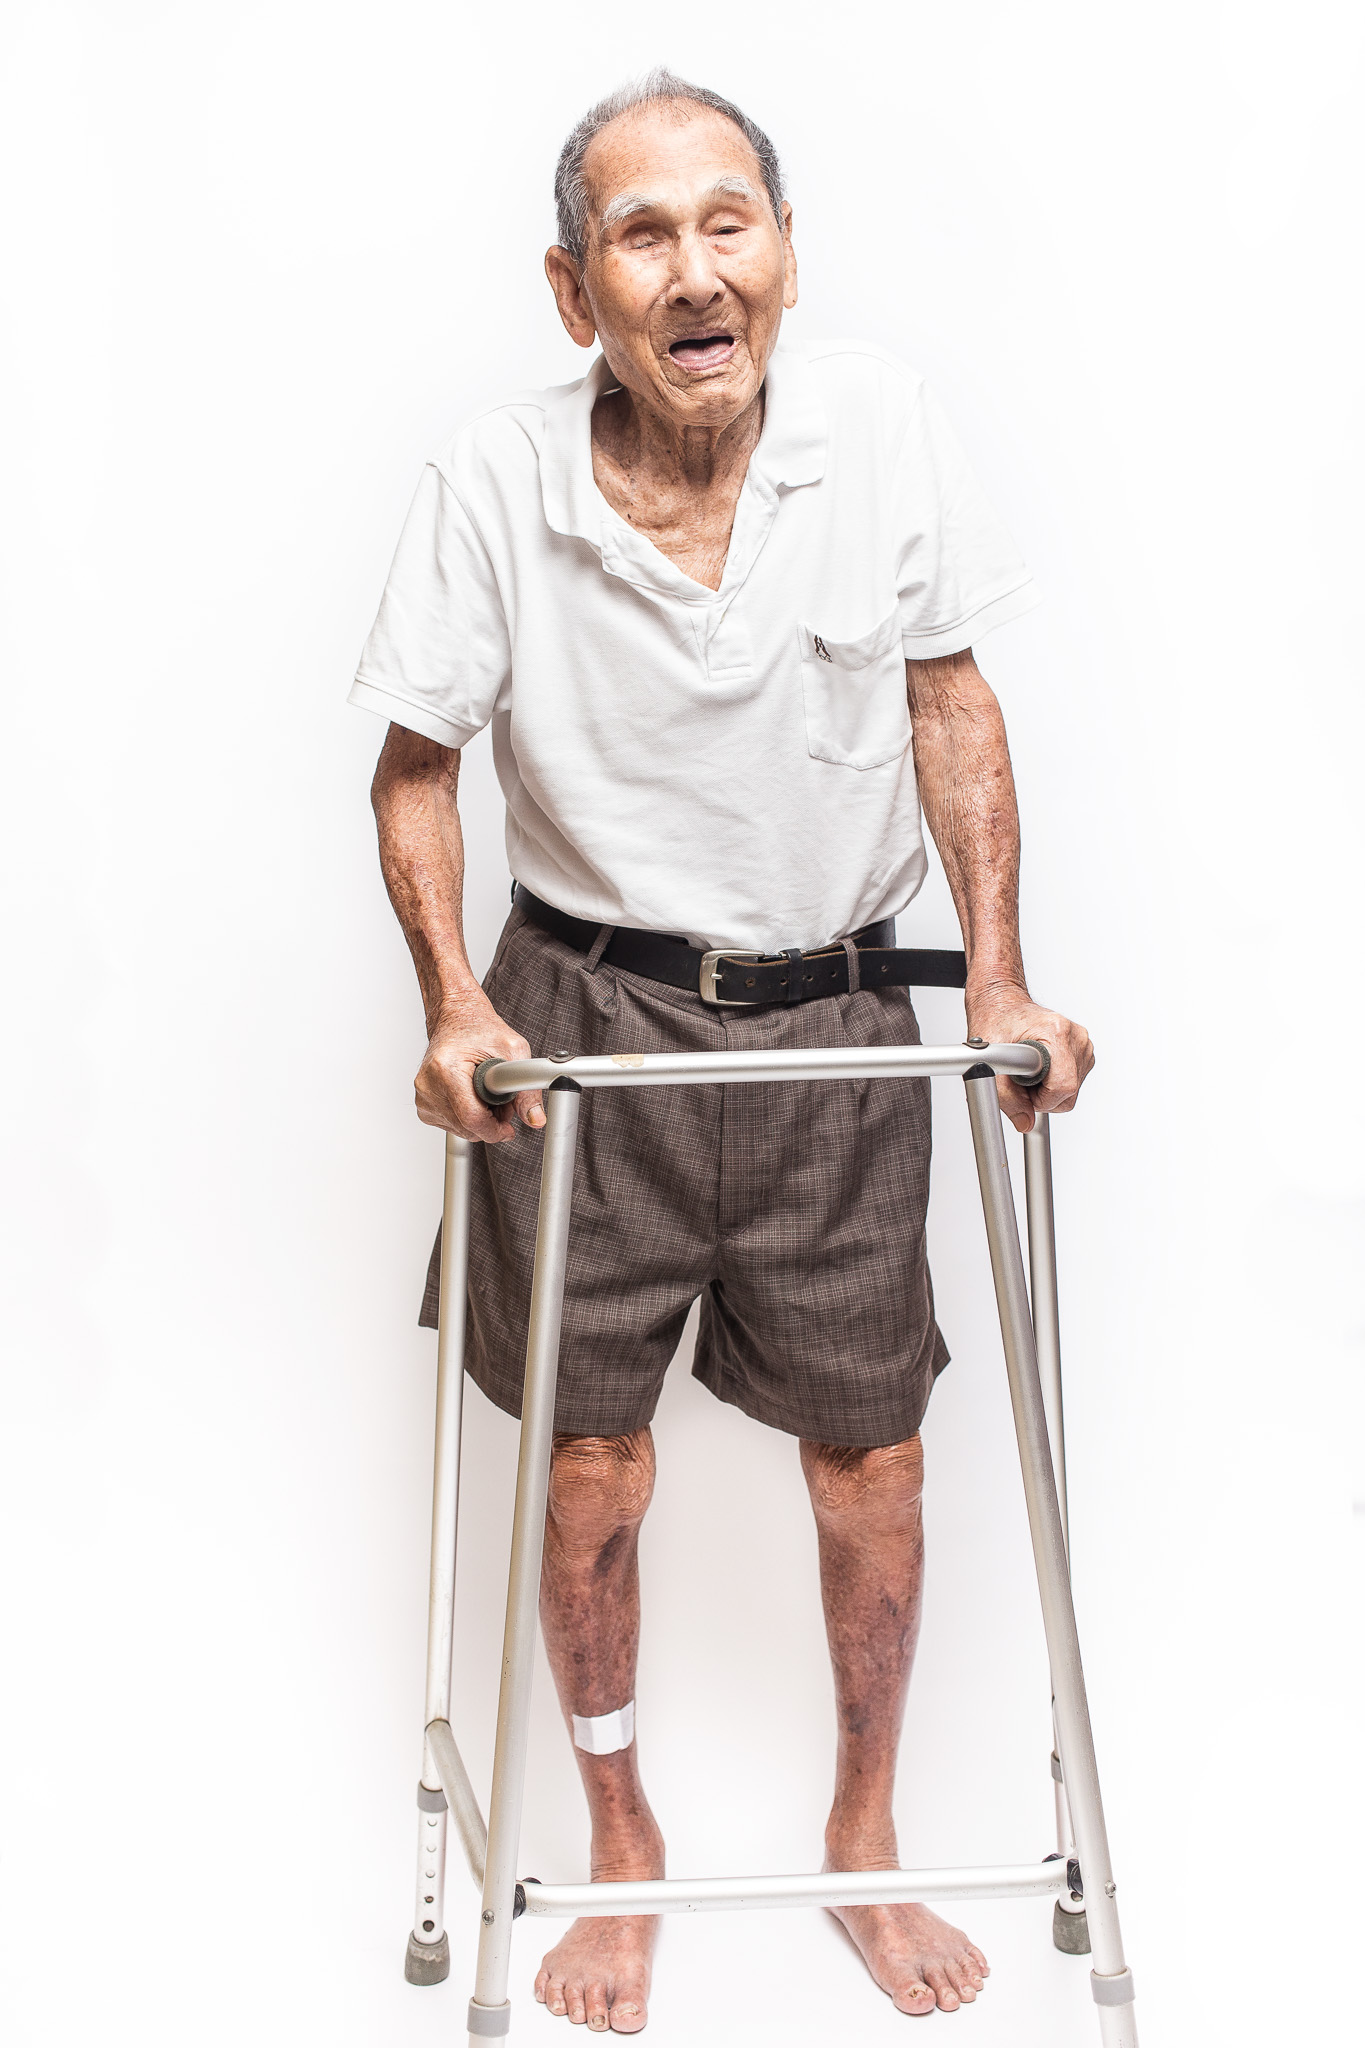 zainal-zainal-studio-centenarians-care-duke-nus-singapore-photographer-12.jpg